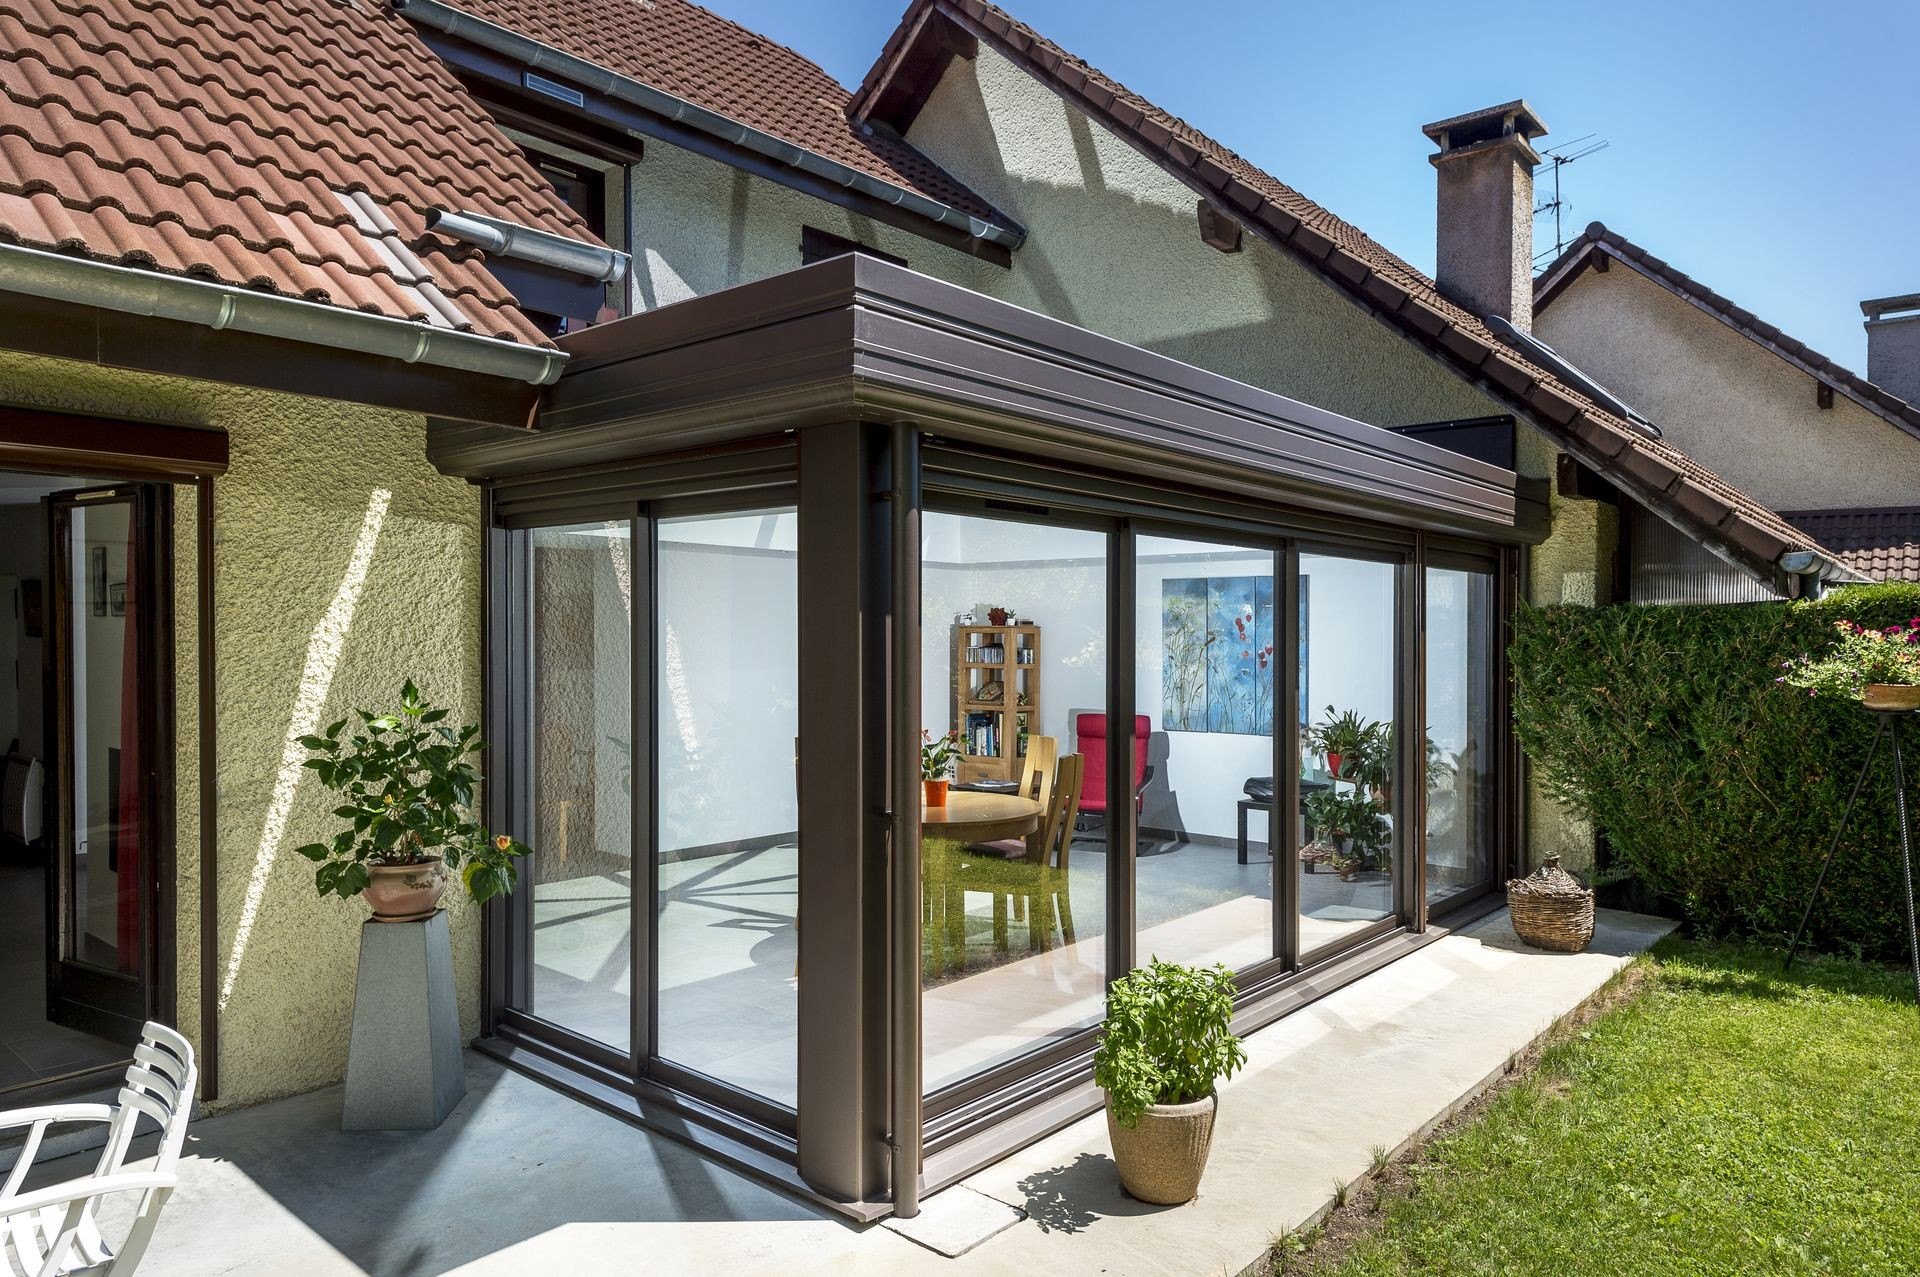 extension toiture plate actuel veranda. Black Bedroom Furniture Sets. Home Design Ideas